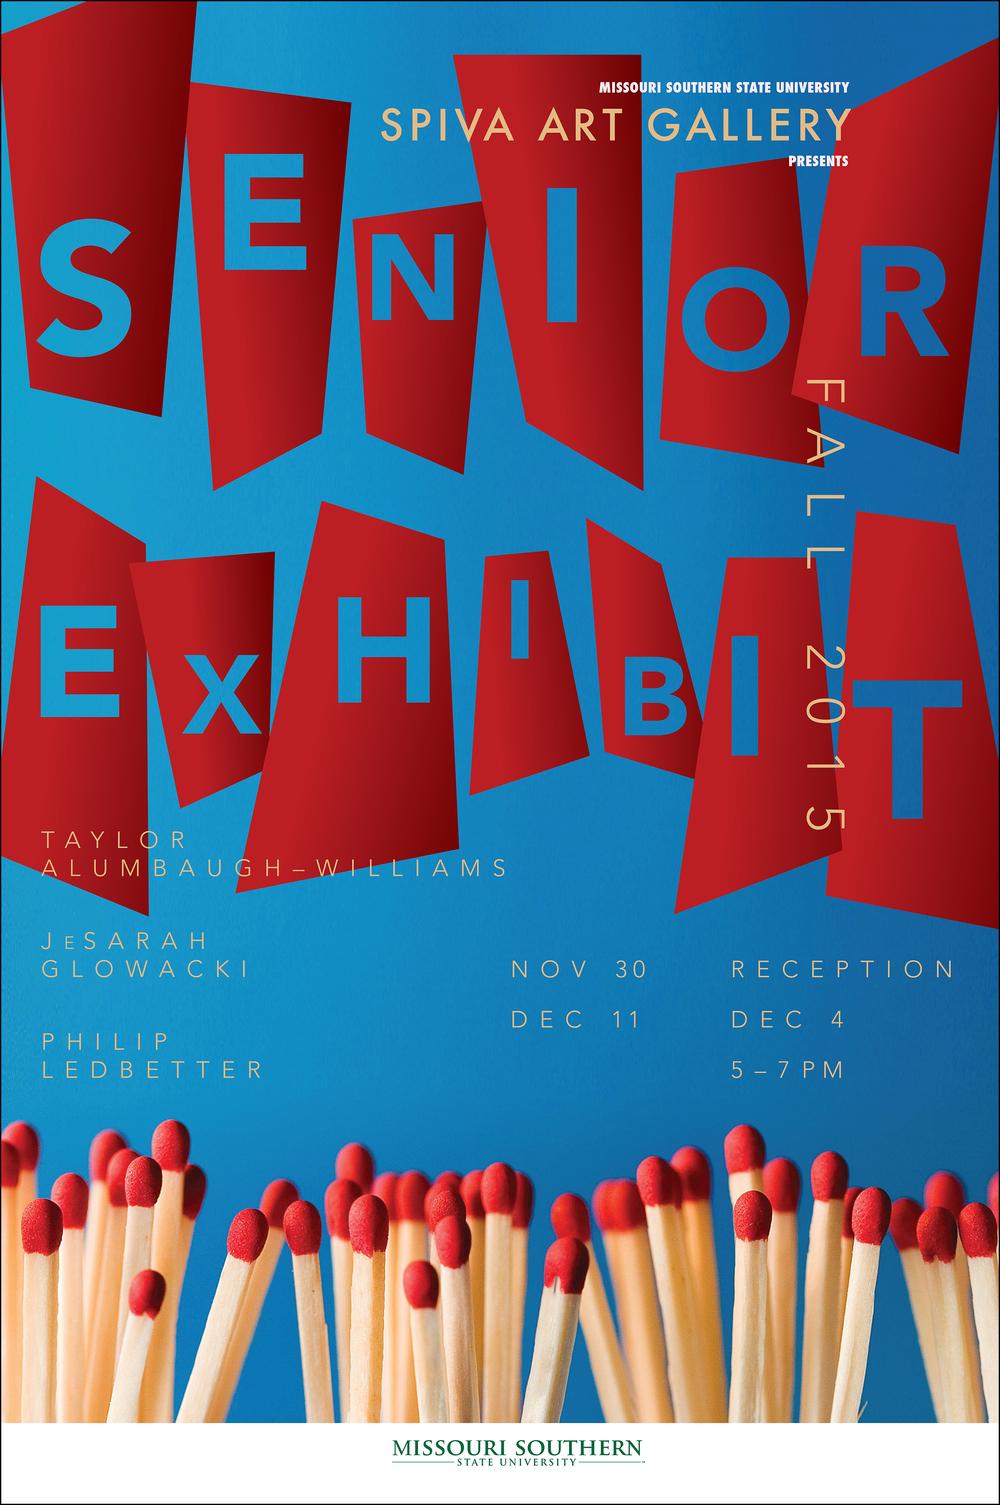 Senior Exhibit, Fall 2015 24x36